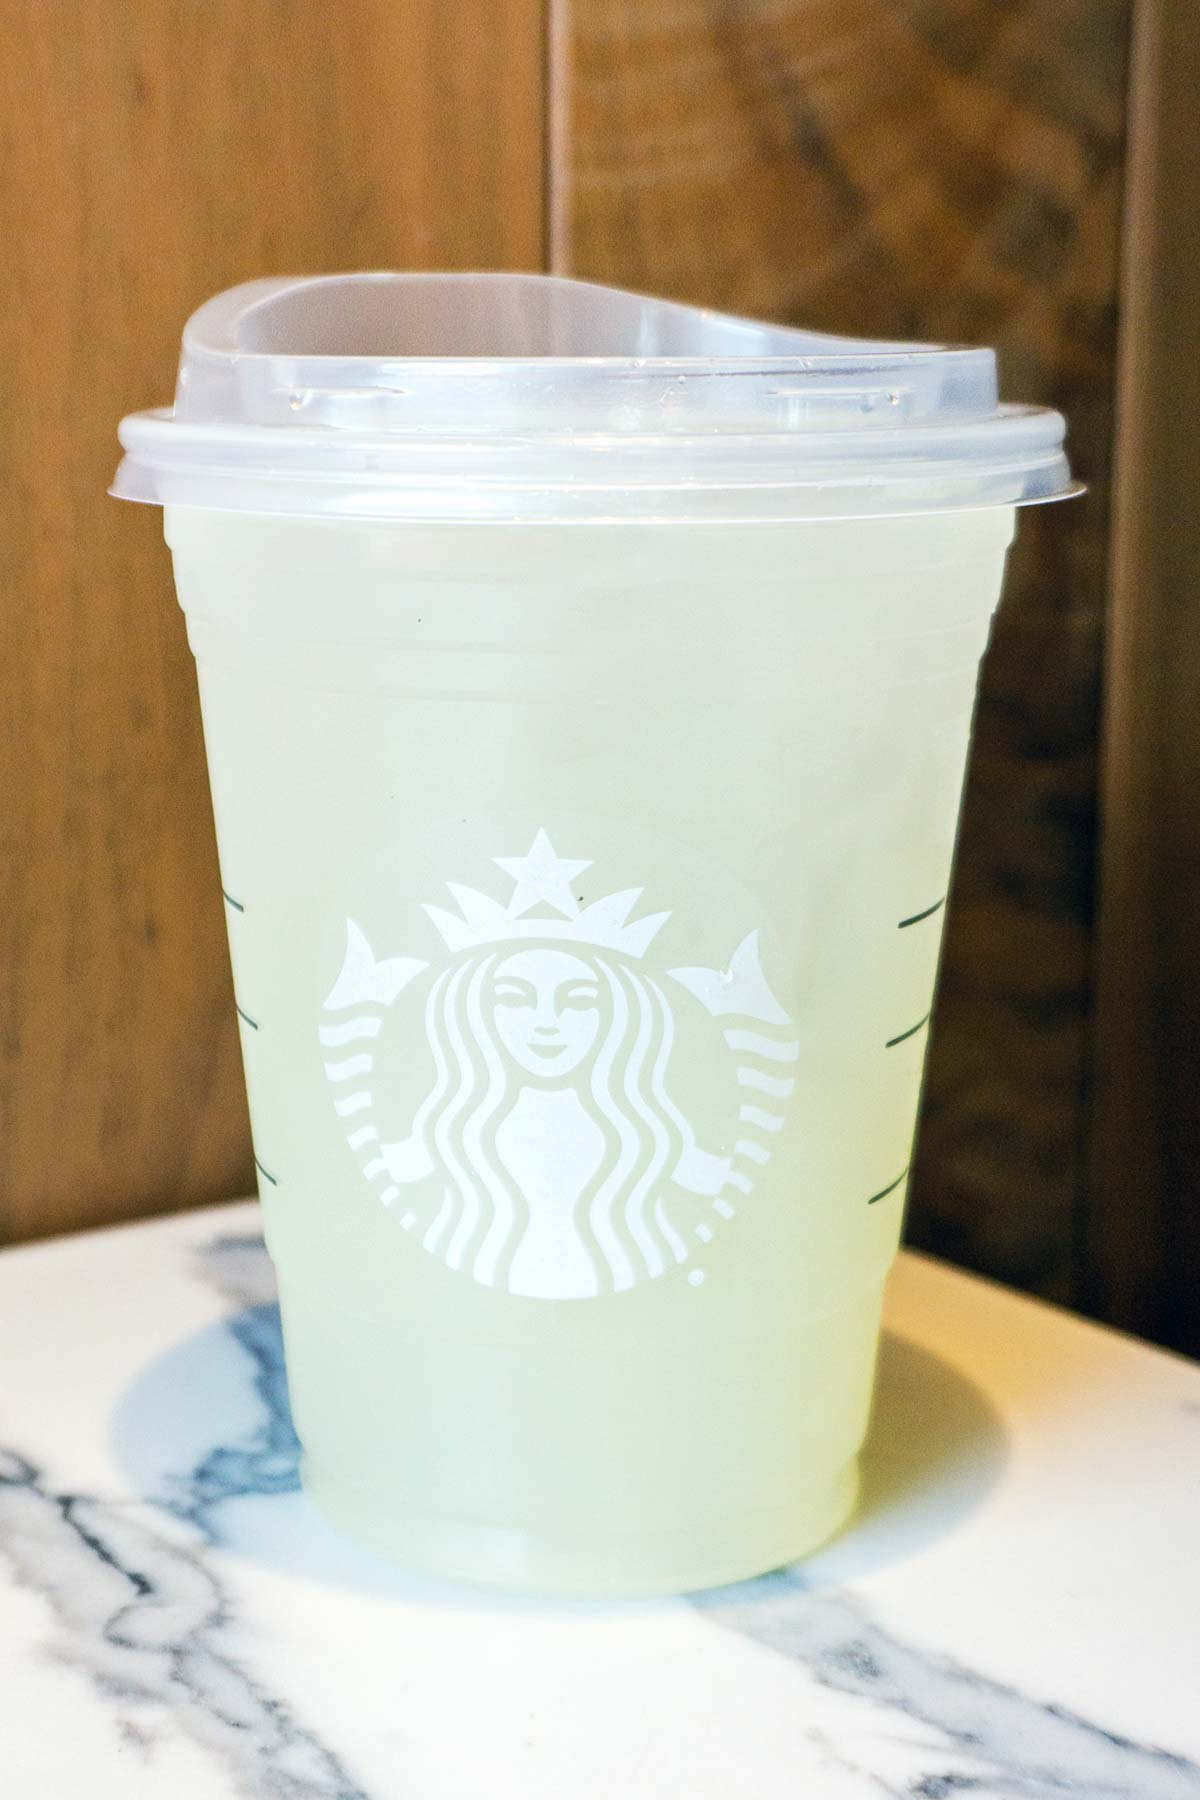 Starbucks Gummy Bear Drink in a cup.